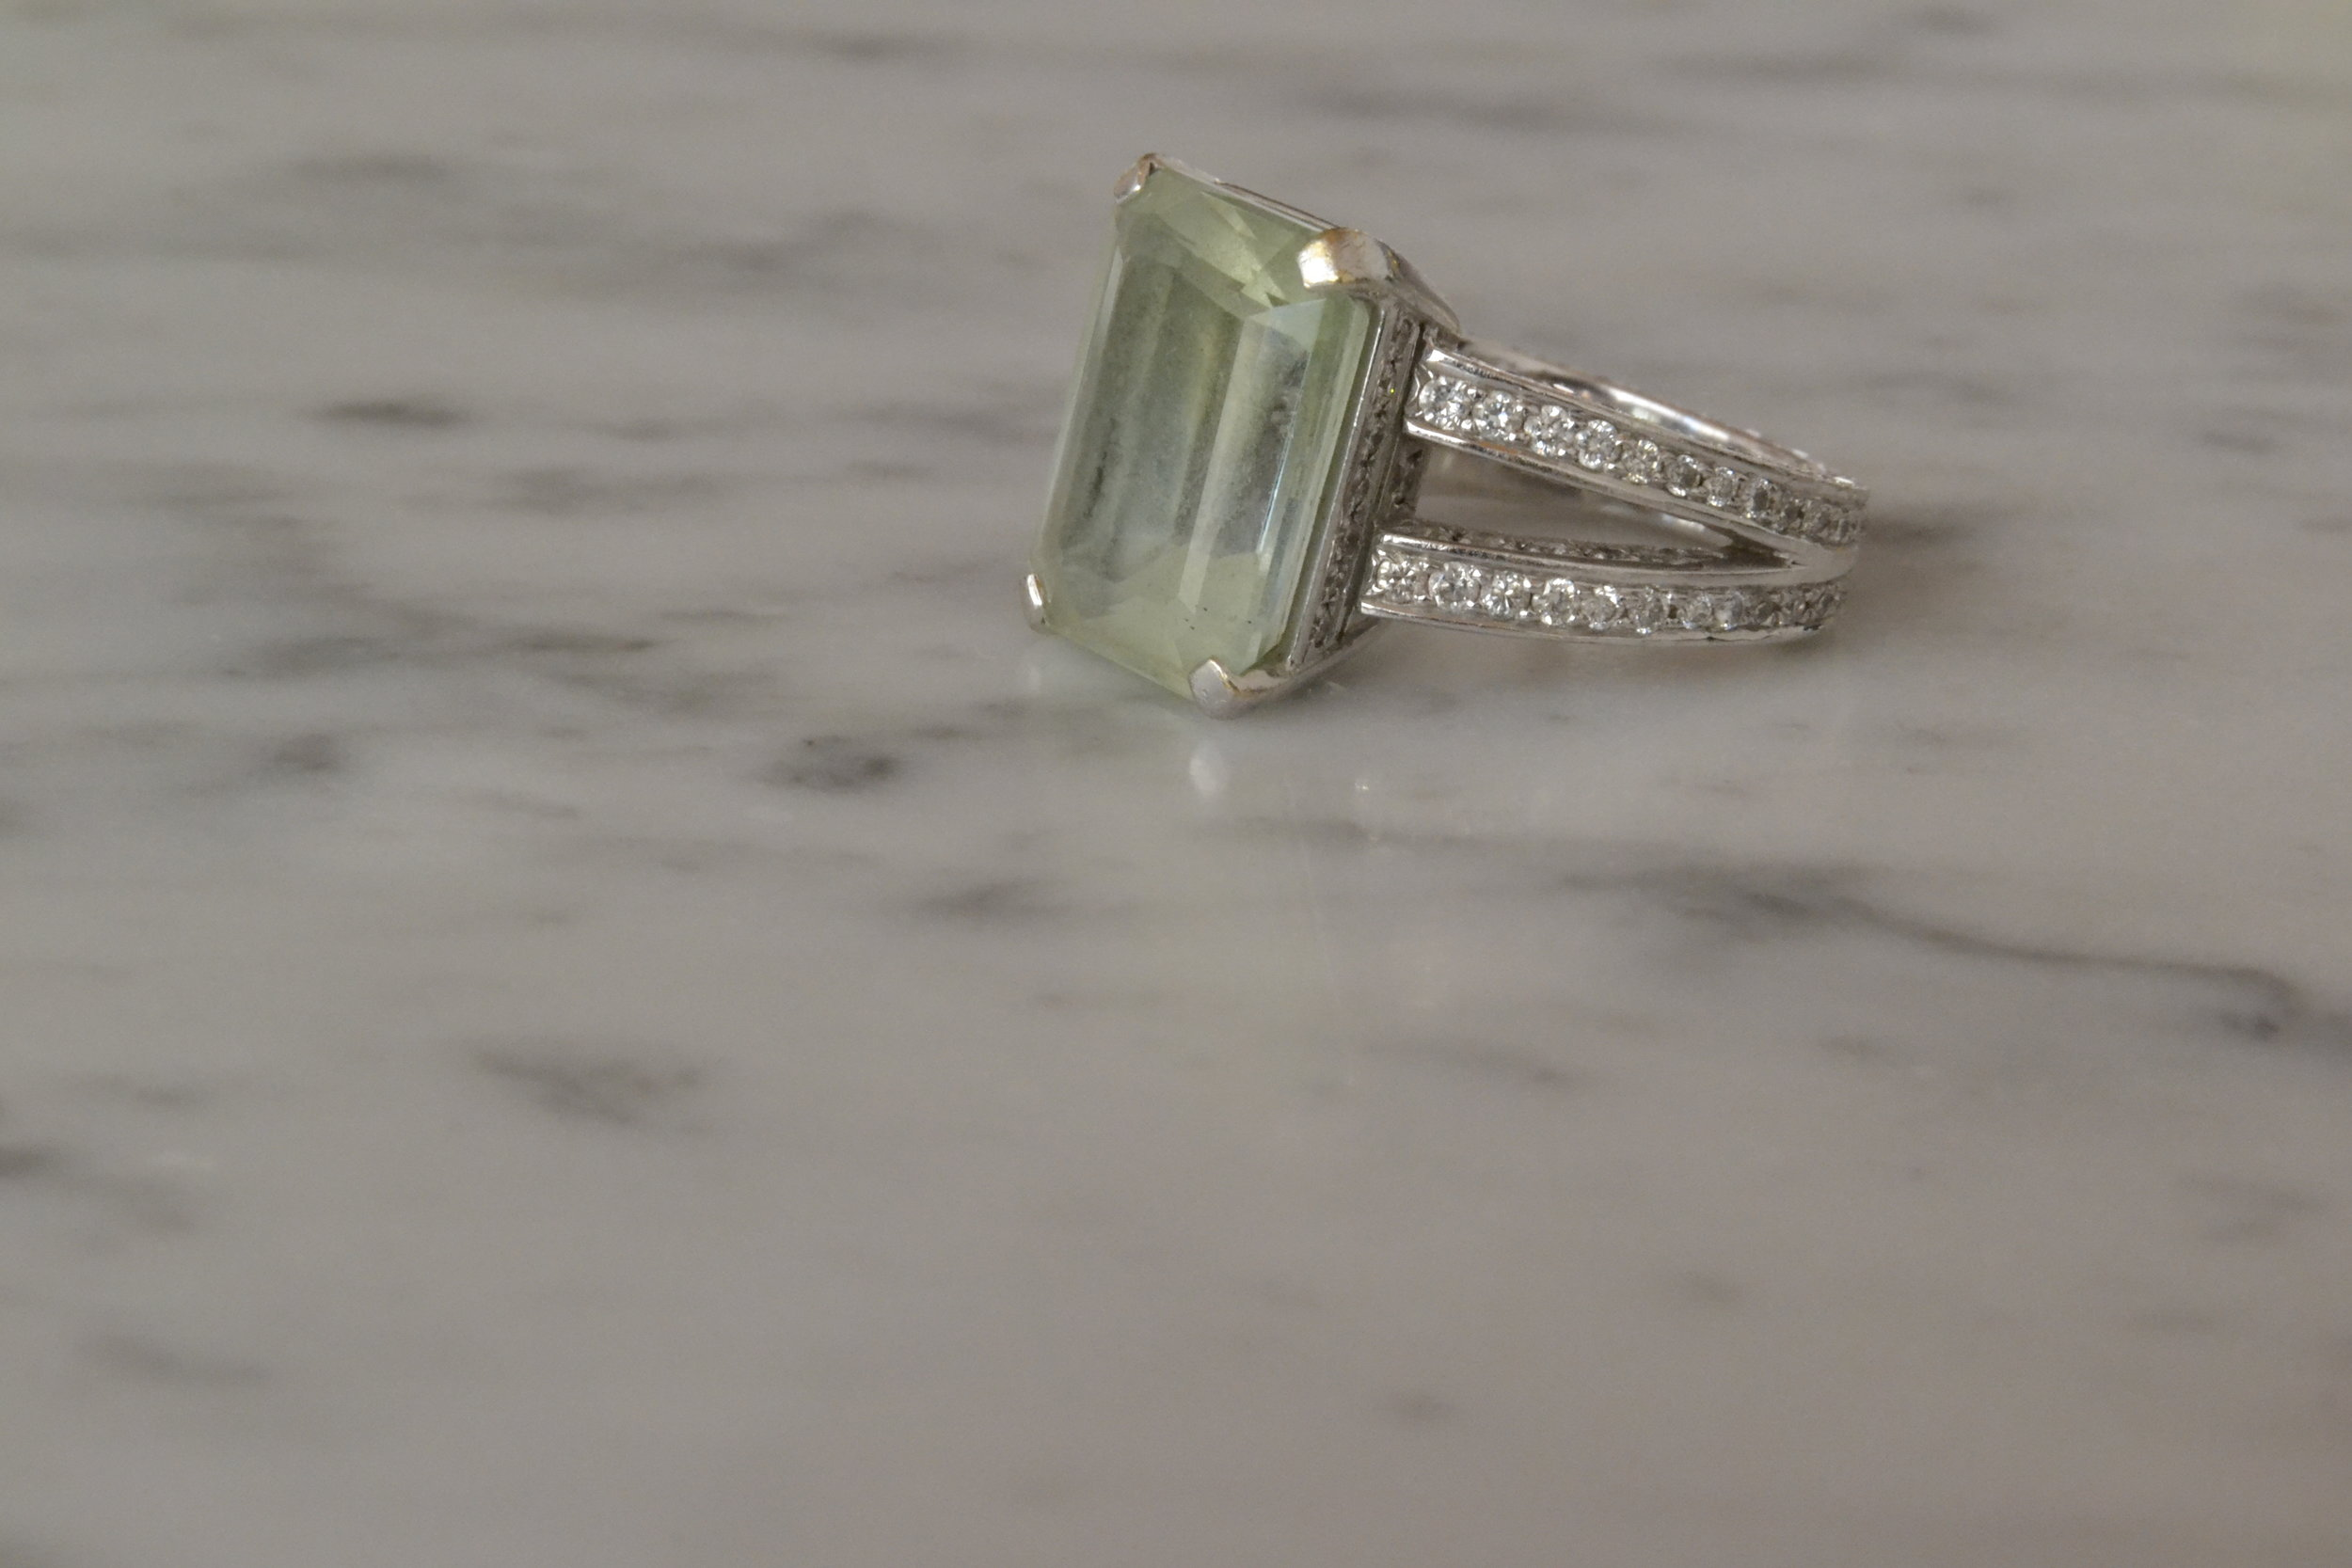 10 carat untreated aquamarine set in white gold with diamonds